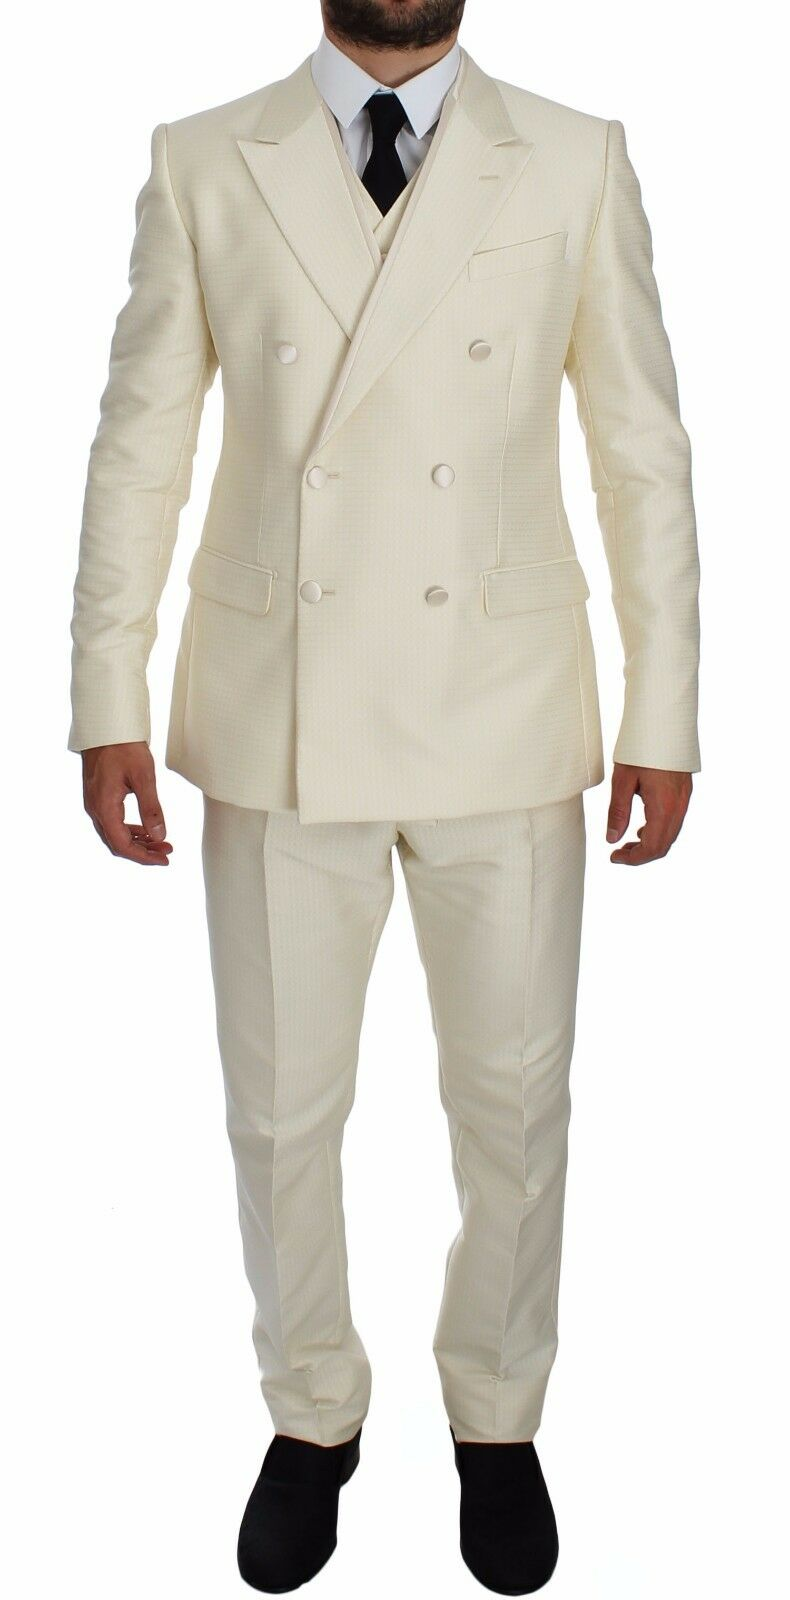 NWT 3200 DOLCE & GABBANA Weiß Slim Double Breasted 3 Piece Suit EU52 / US42/XL